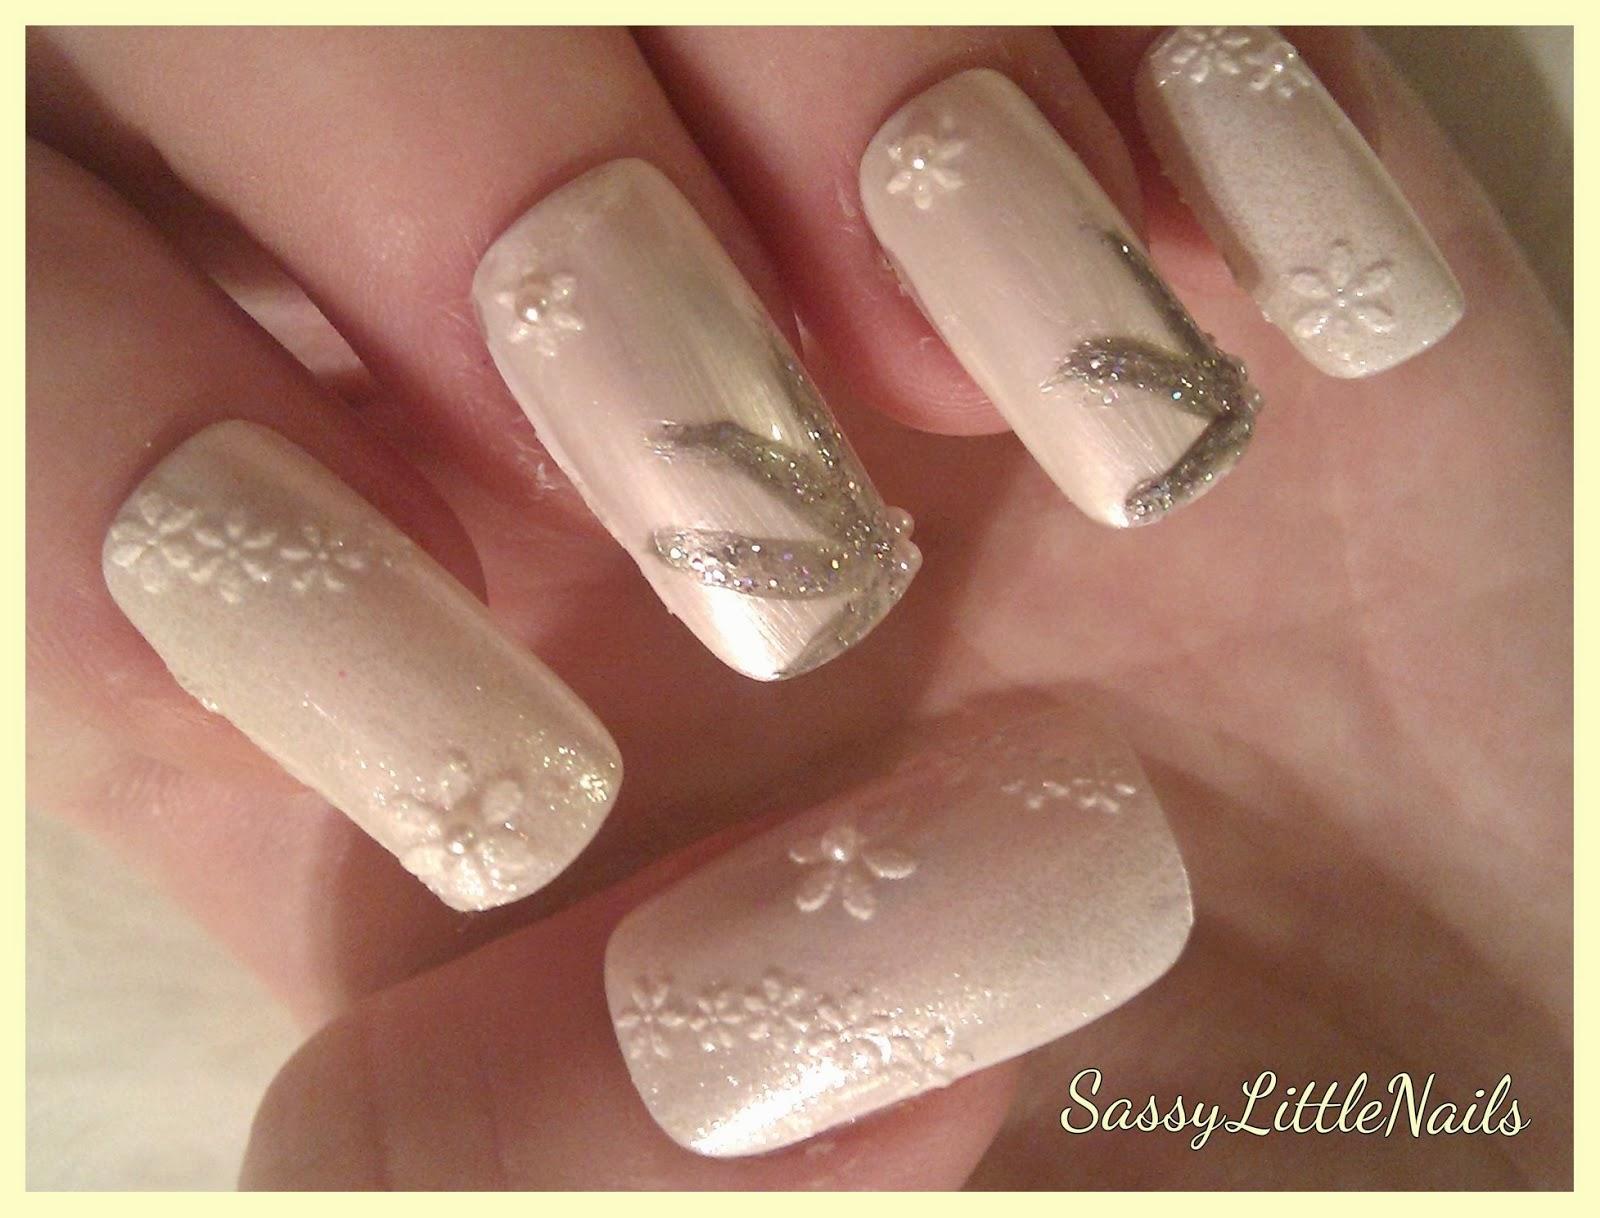 SassyLittleNails: Sparkly Nails review Nail art.